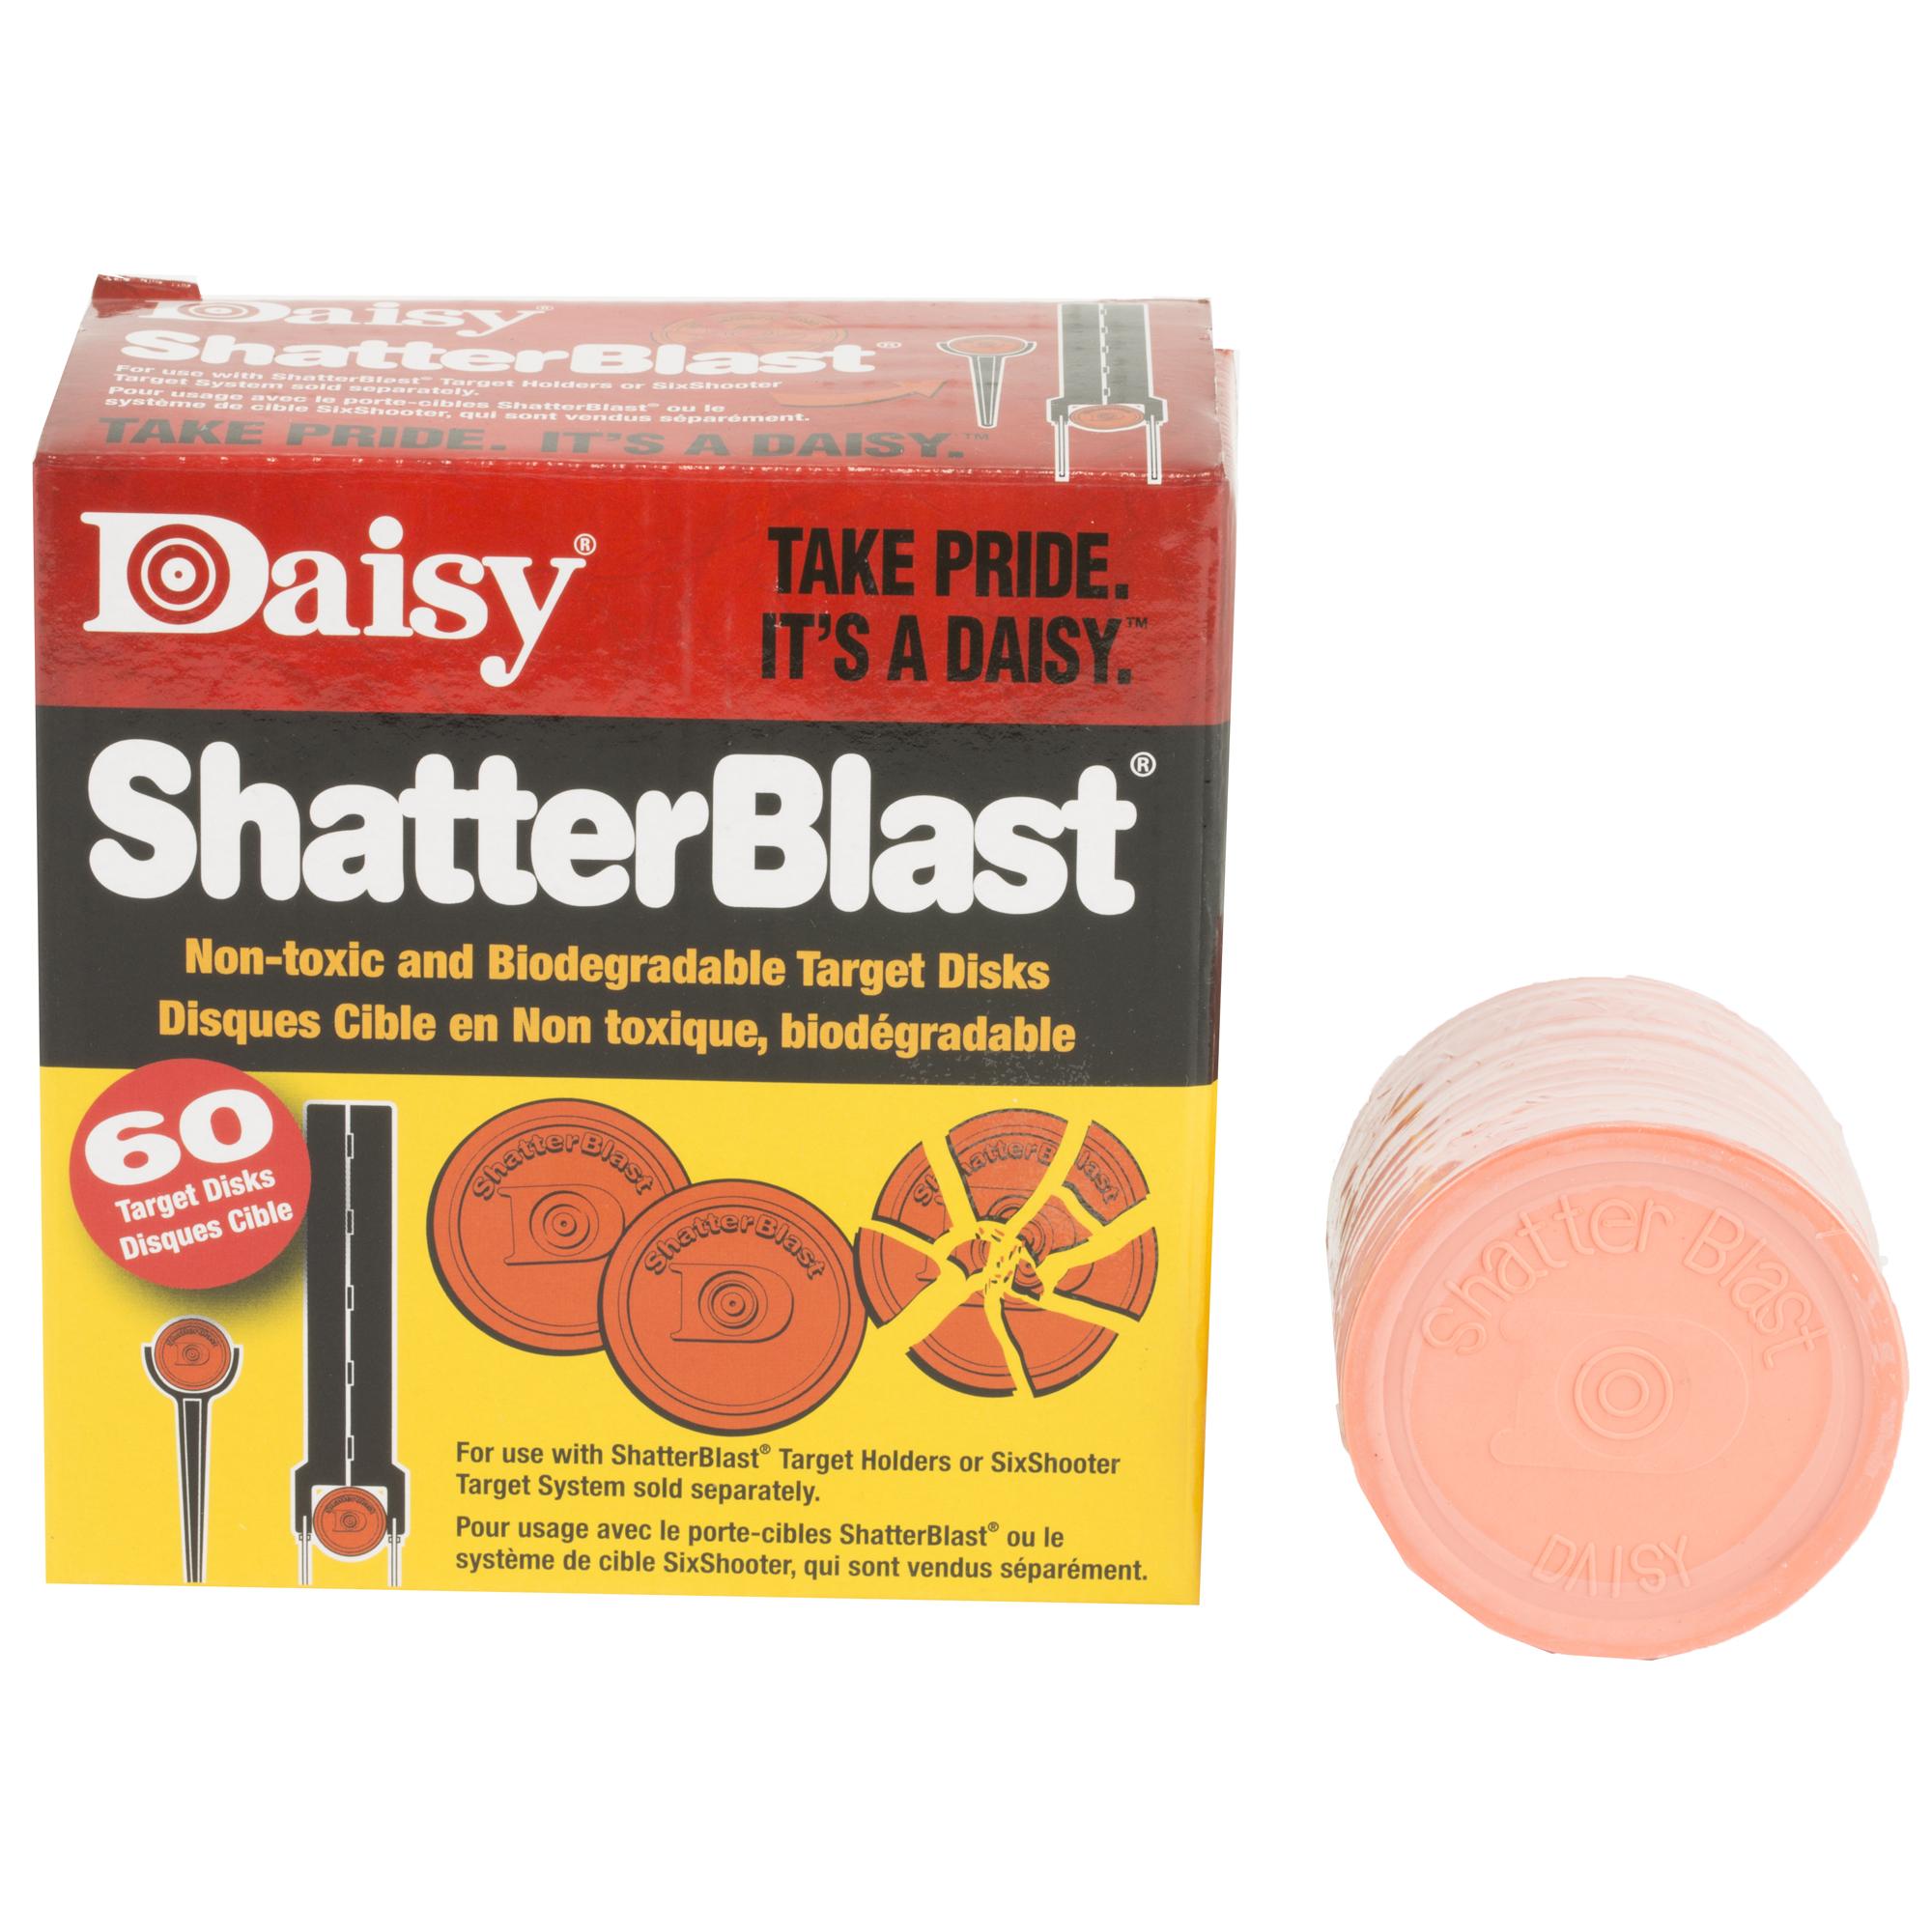 "Daisy 2"" Shatterblast Trgts 60/pk"